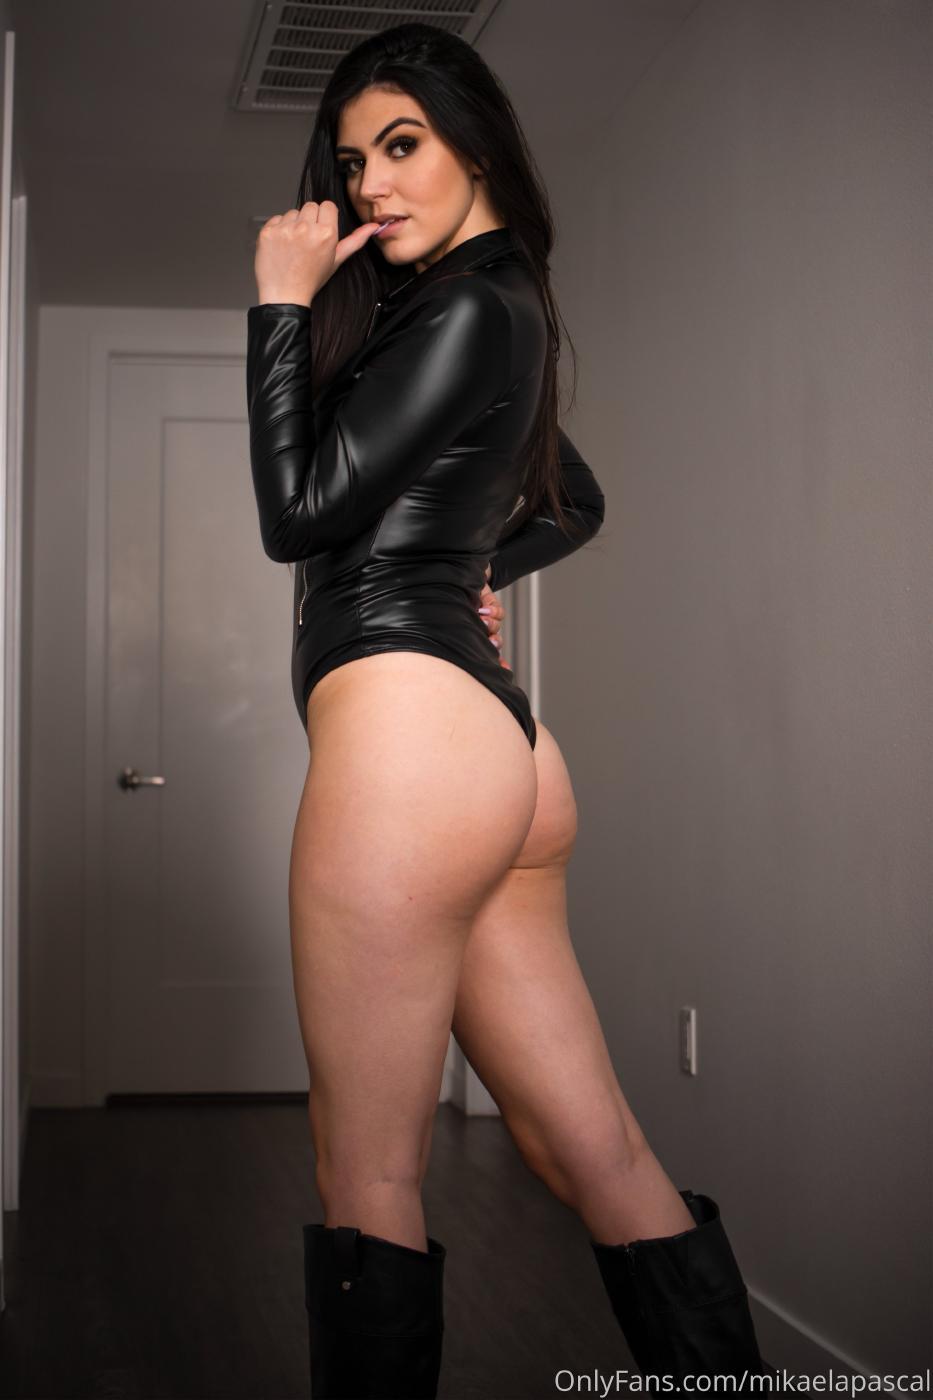 Mikaela Pascal Sexy Leather Bodysuit Onlyfans Set Leaked 0017